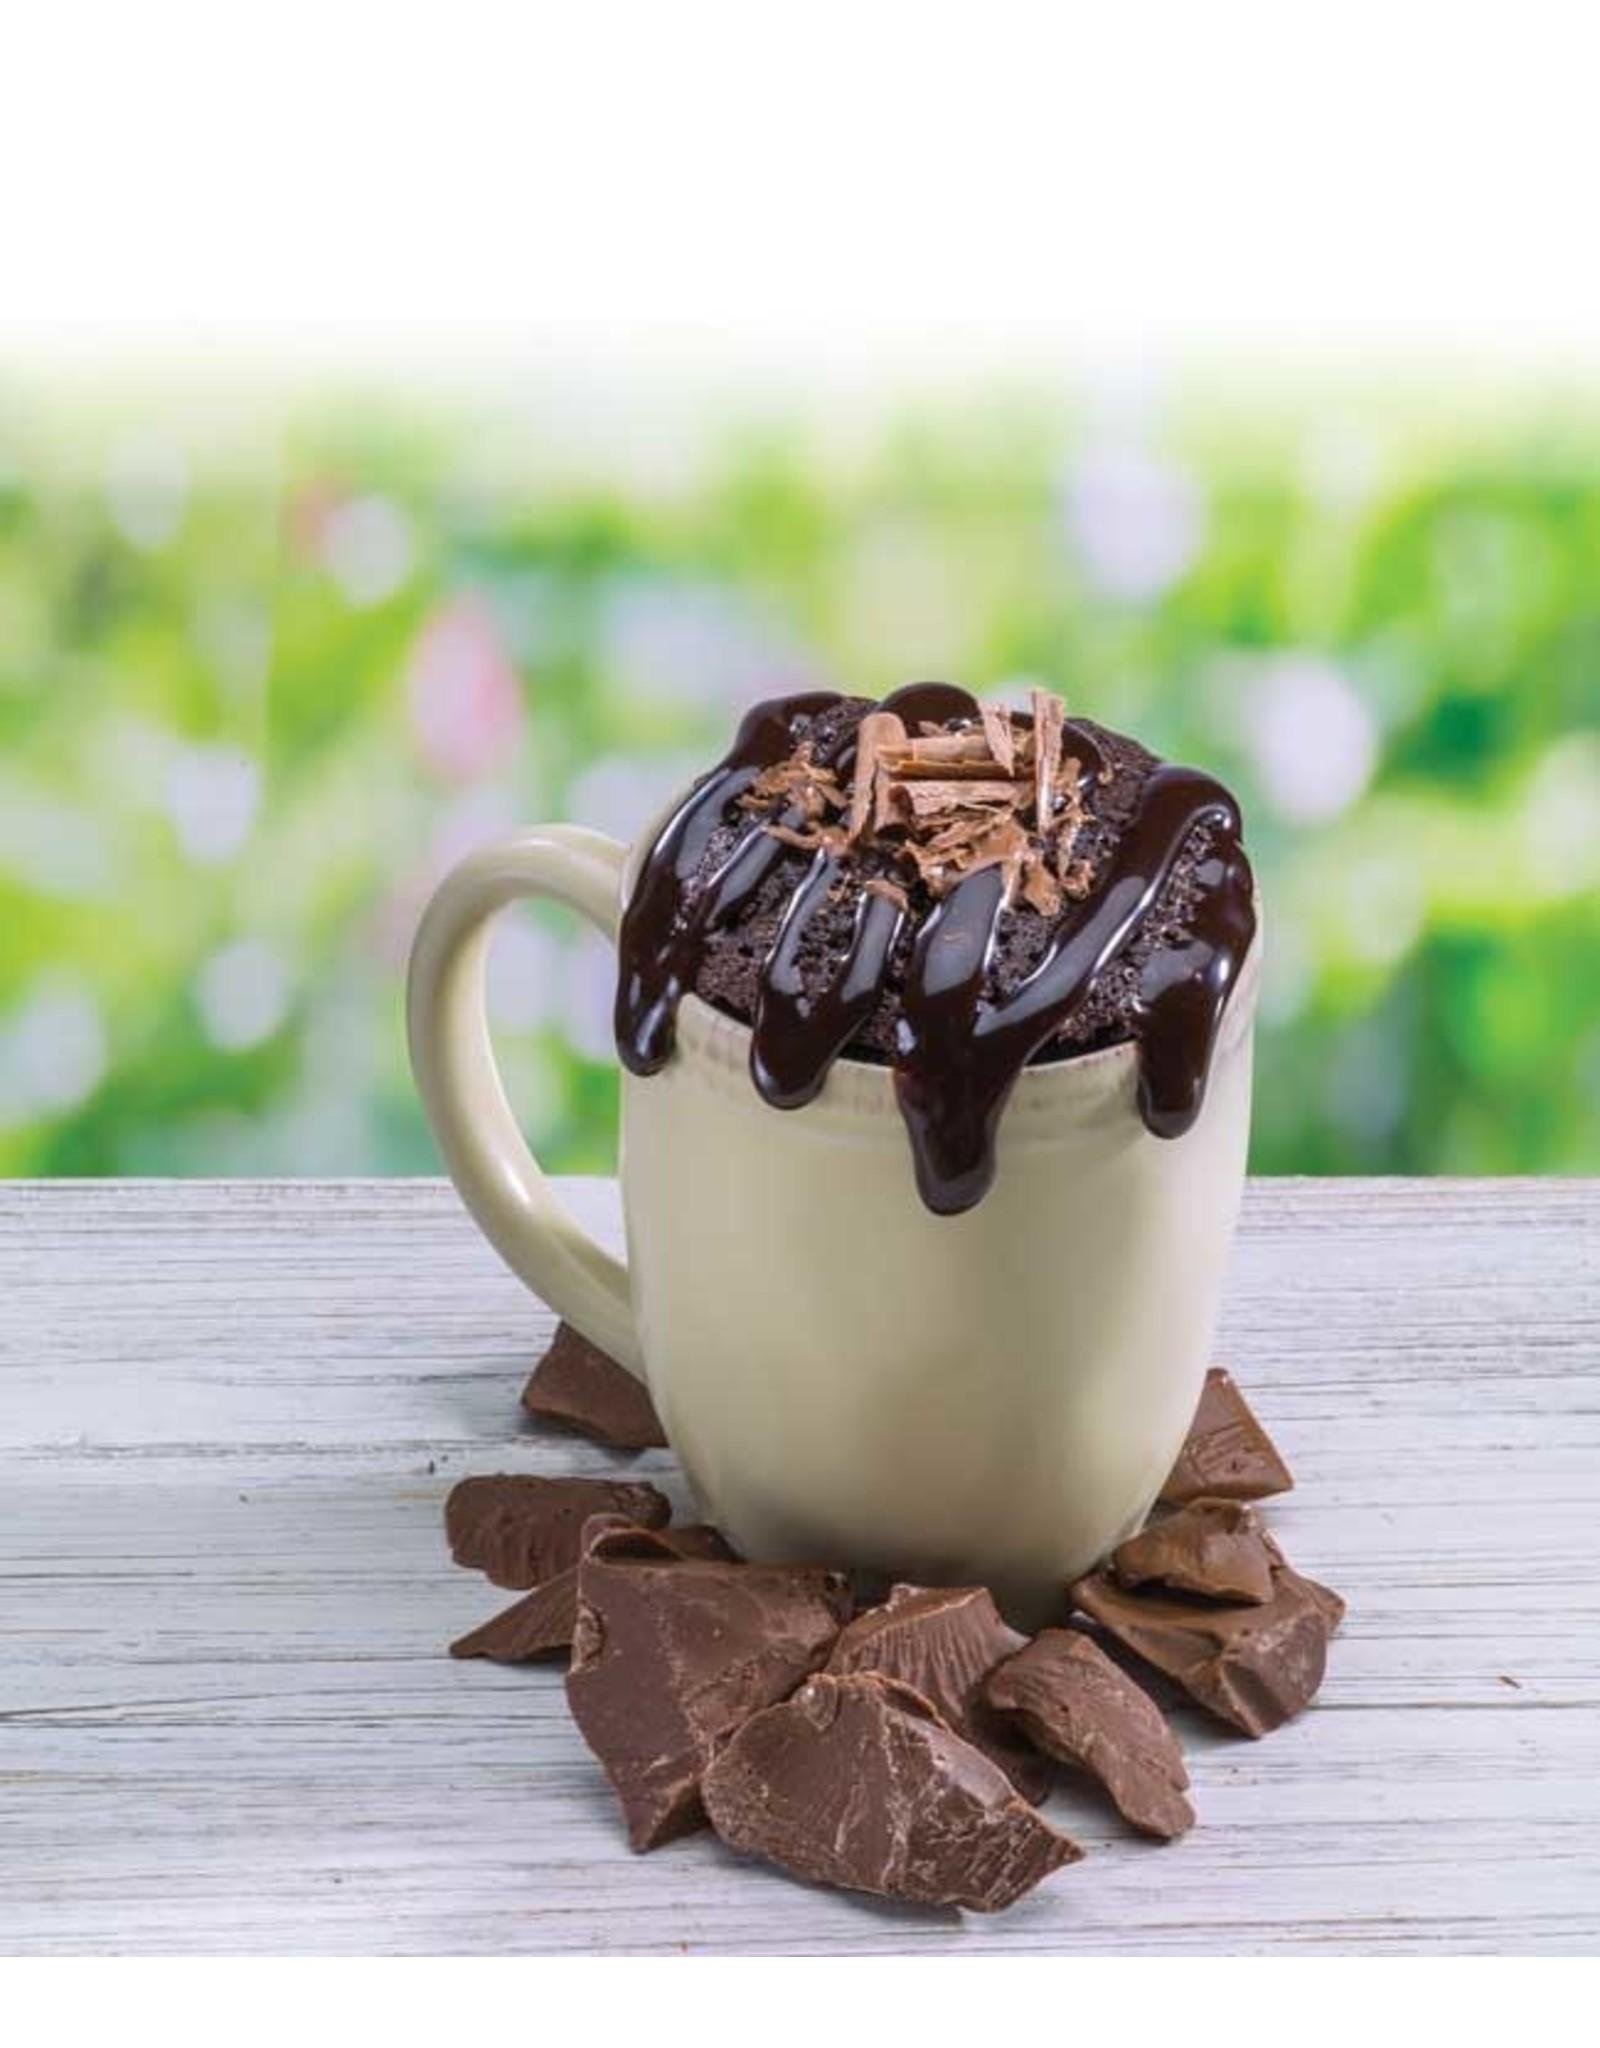 Single Serve Mug Brownie, Ooey Gooey Chocolate, 2.75 oz